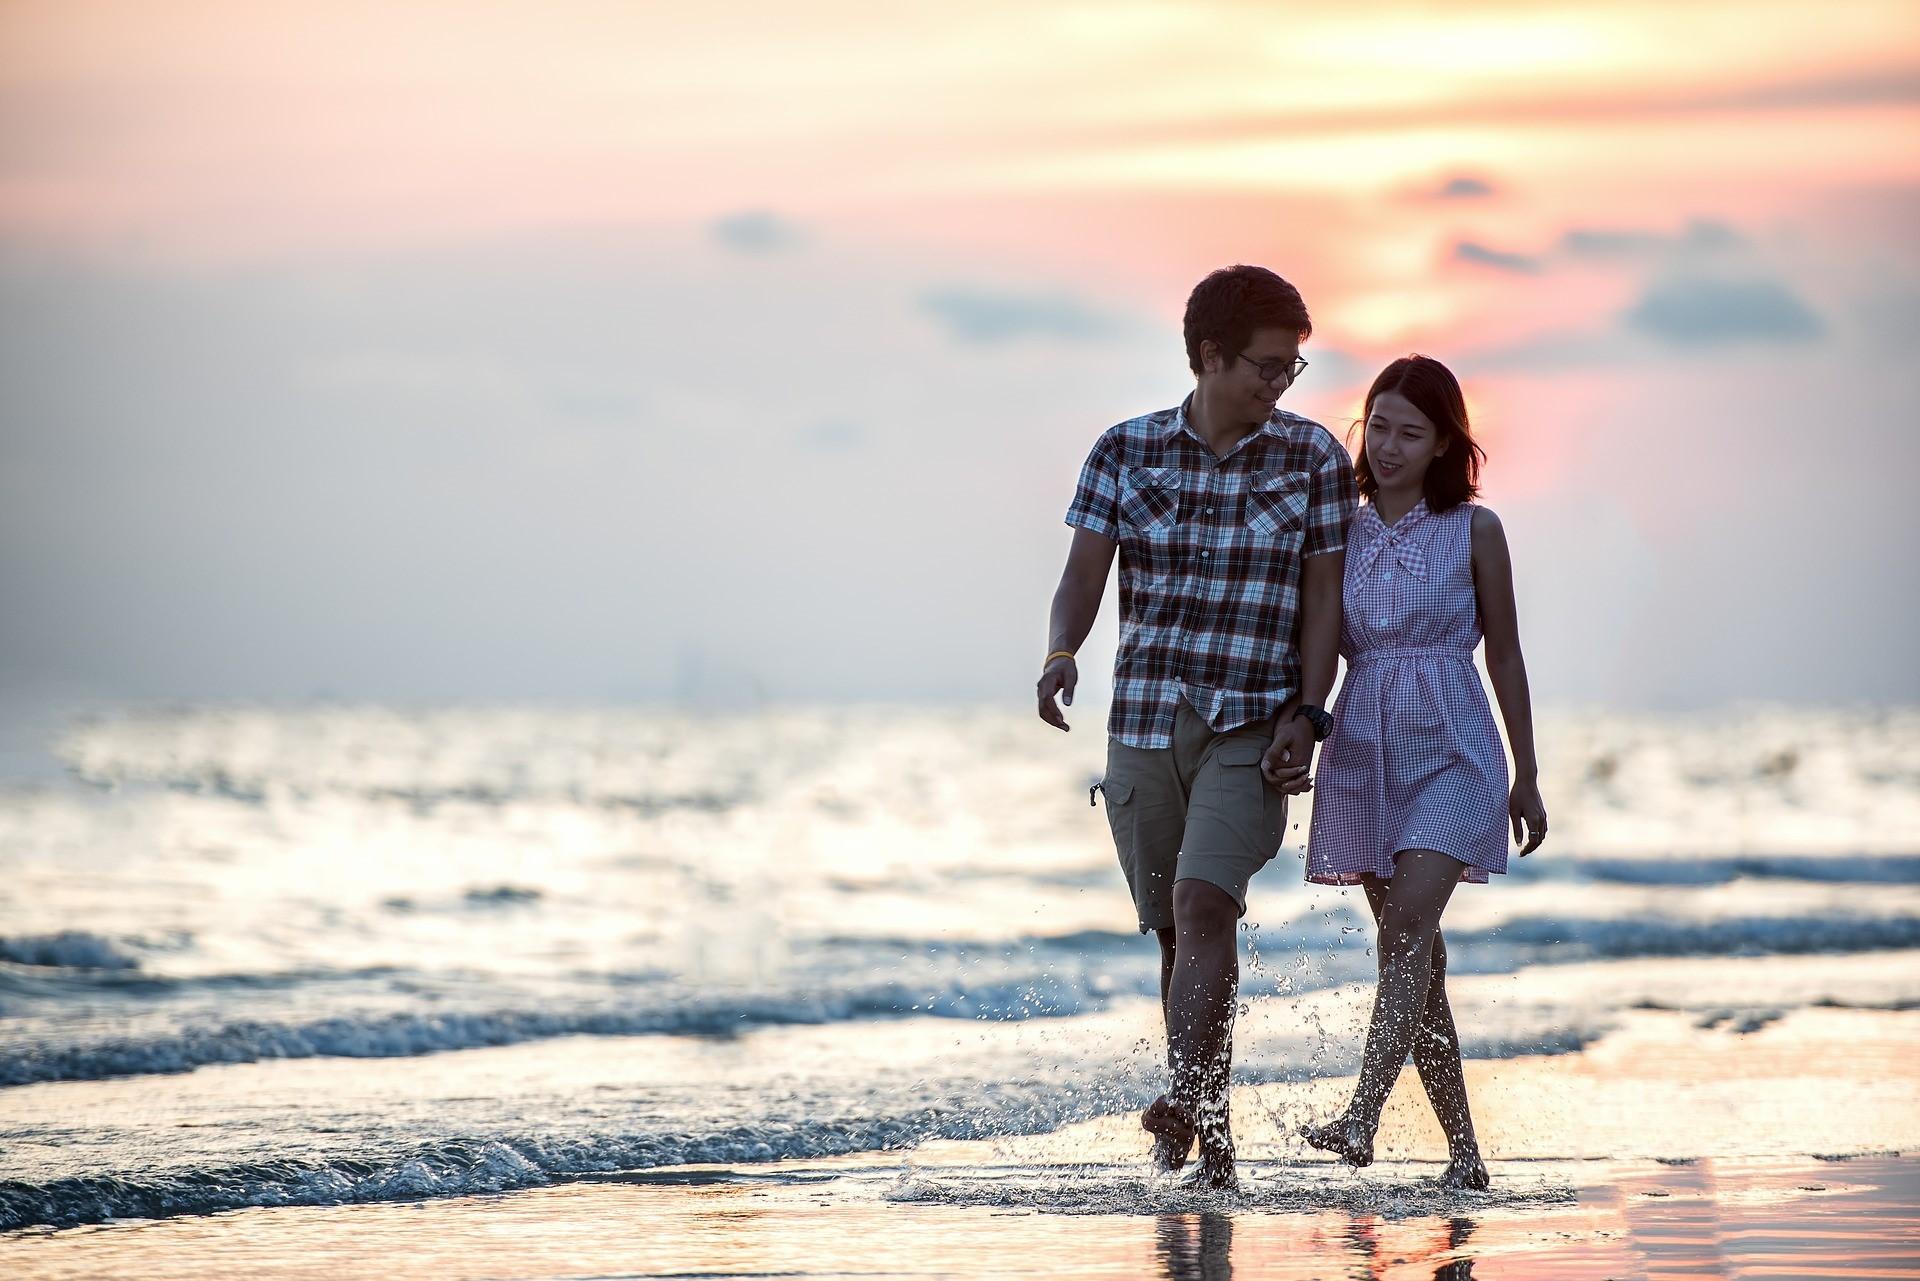 5 ideas for a romantic, budget-friendly British date | VisitBritain